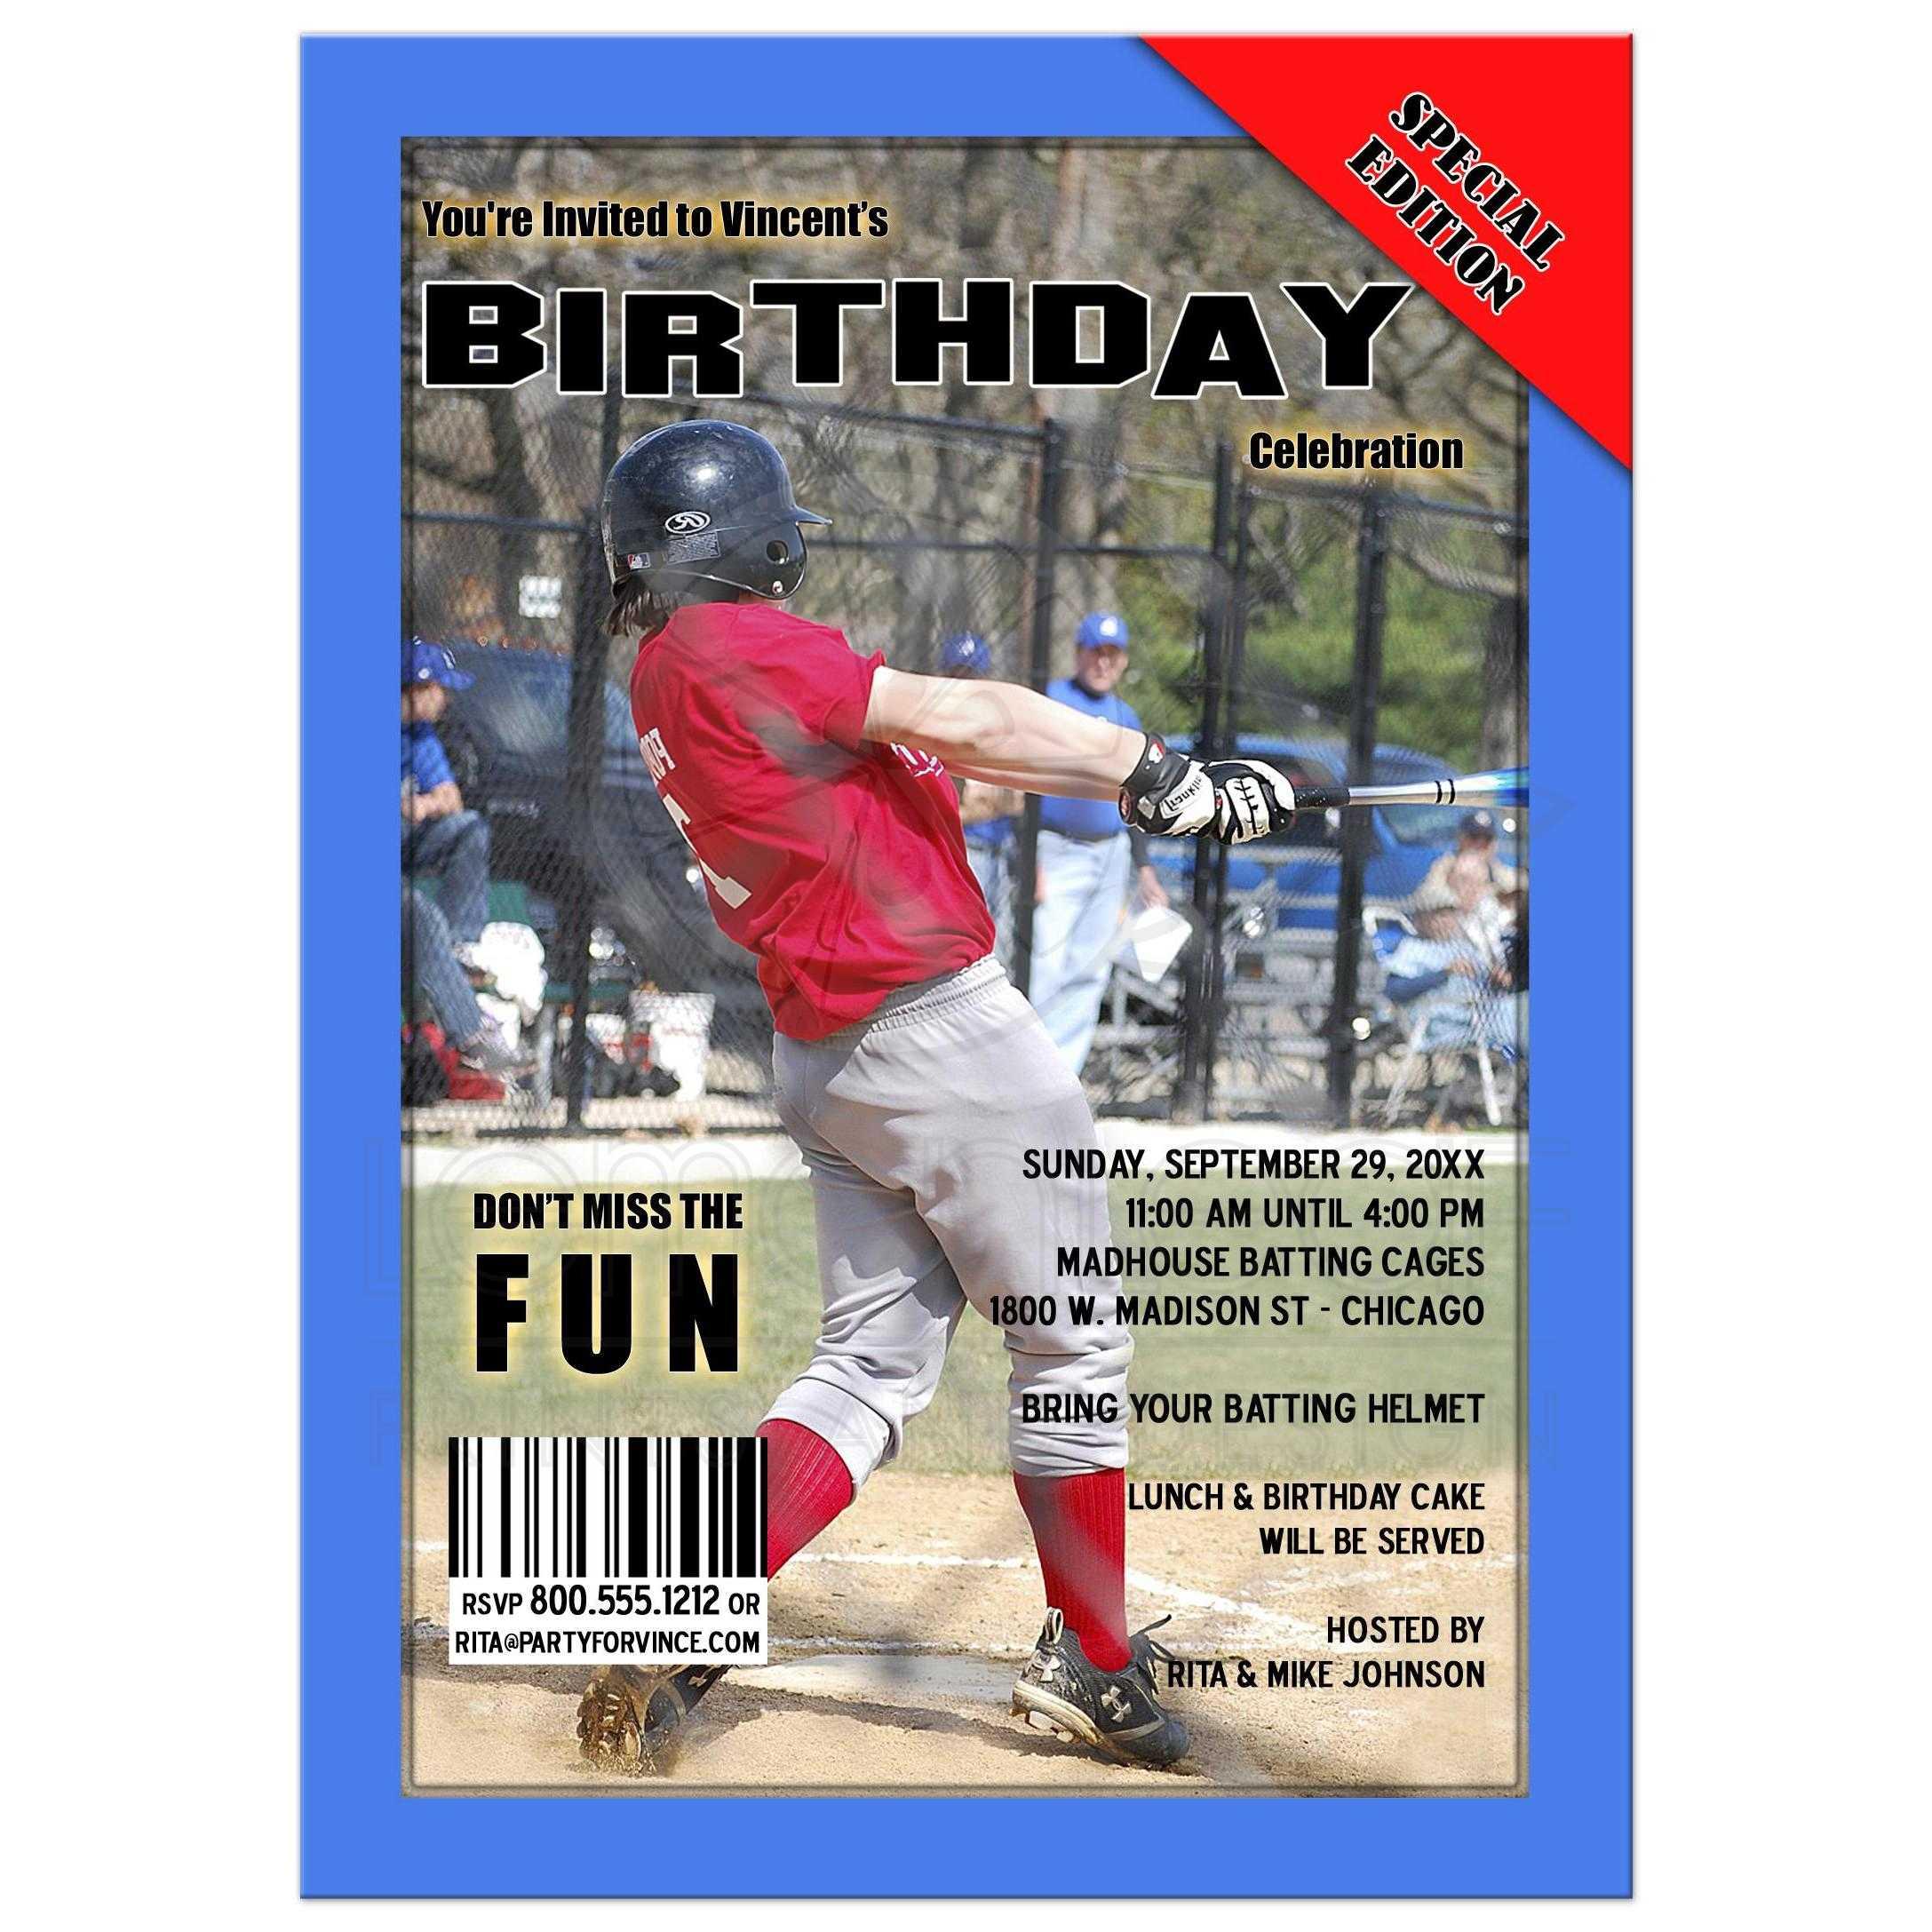 Blue Sports Magazine Cover Style Birthday Party Photo Invitation